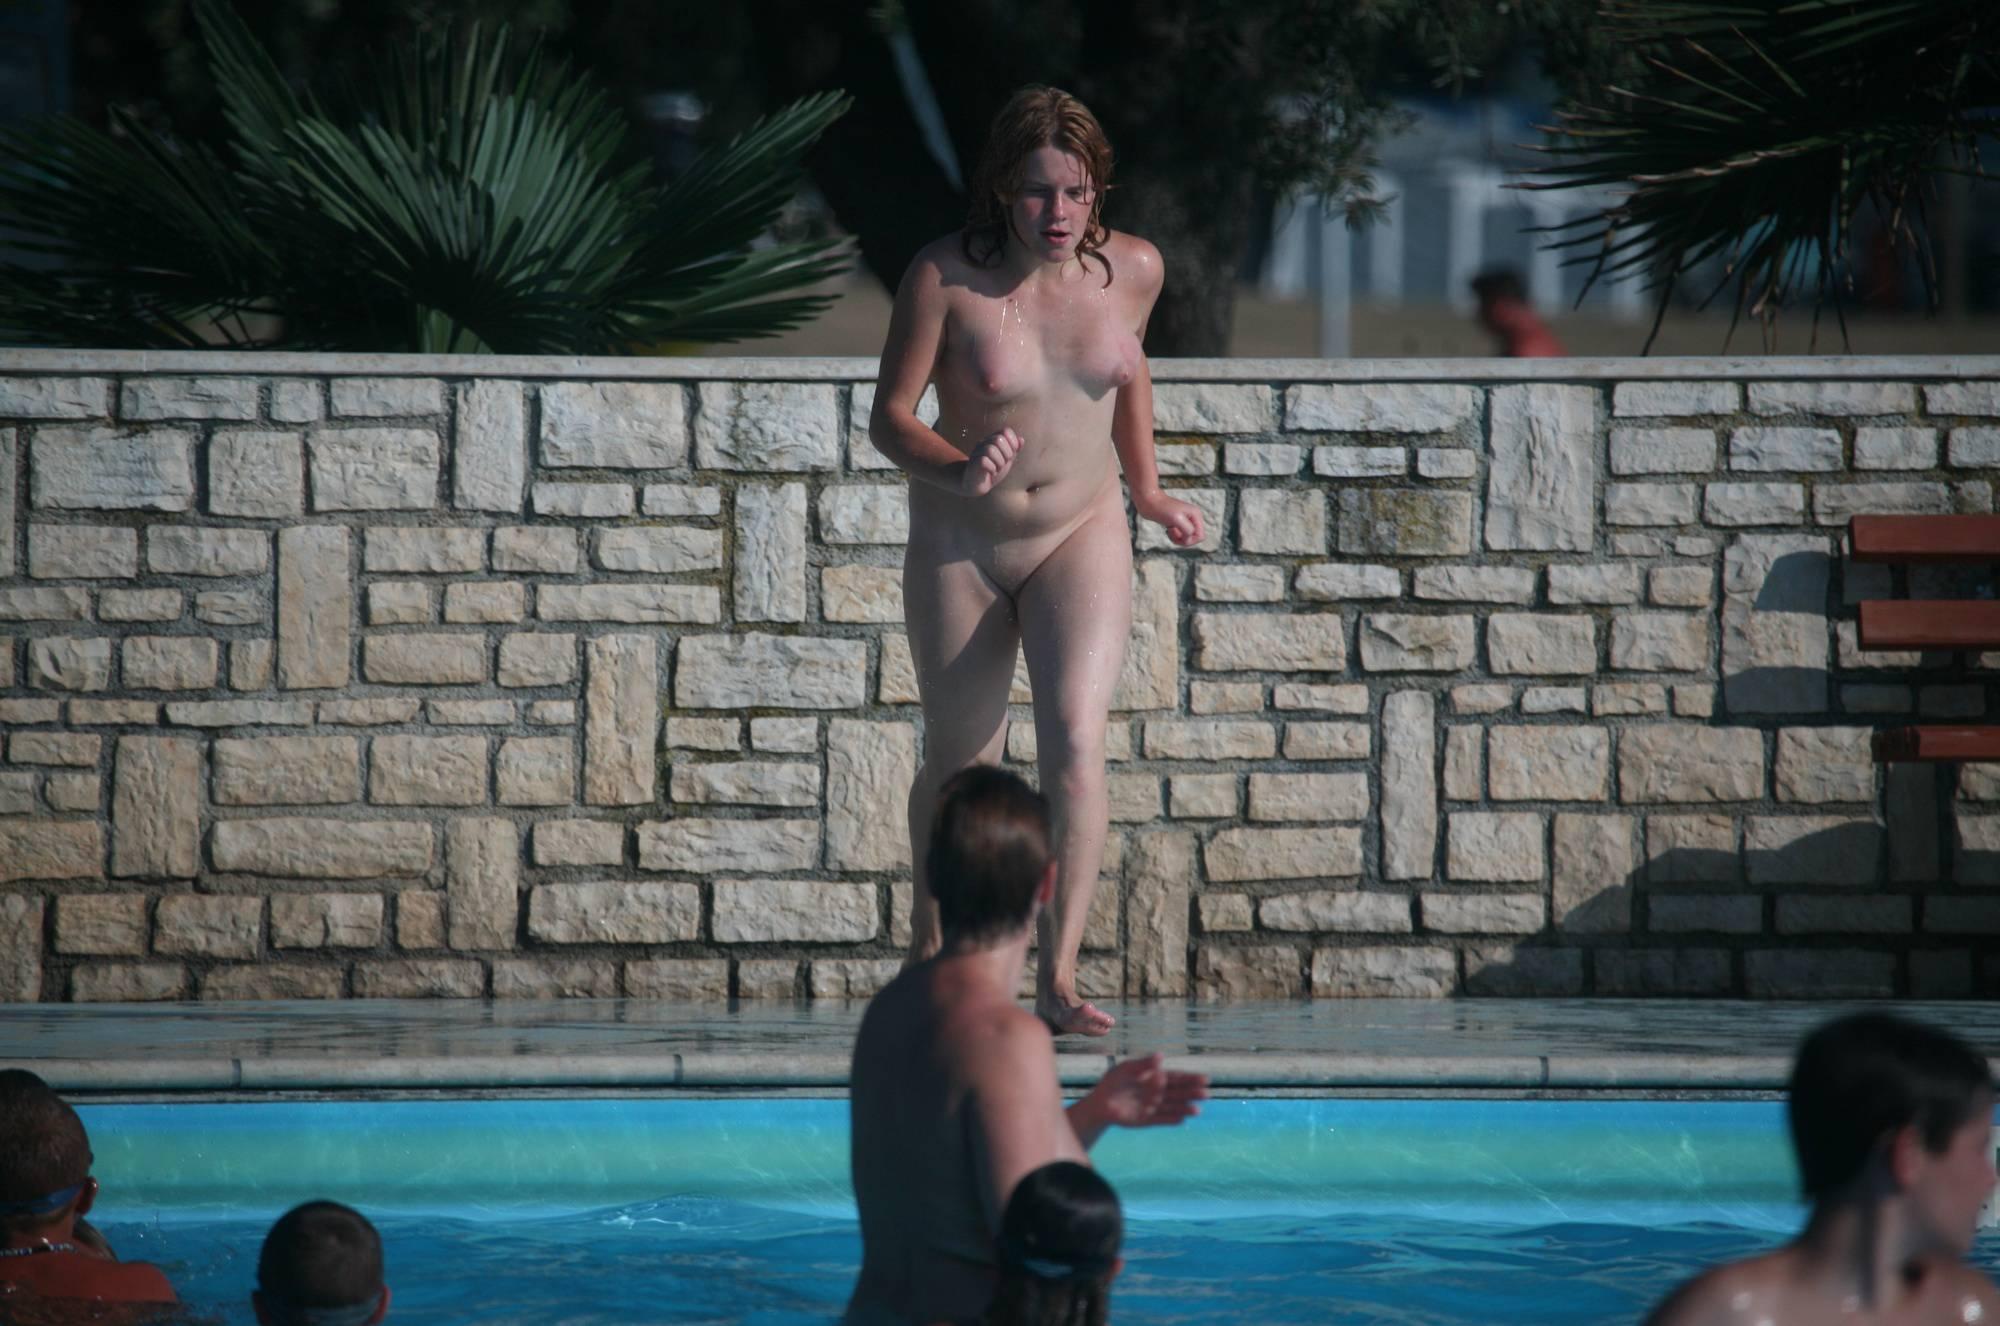 Nudist Pool Jumpers Two - 2